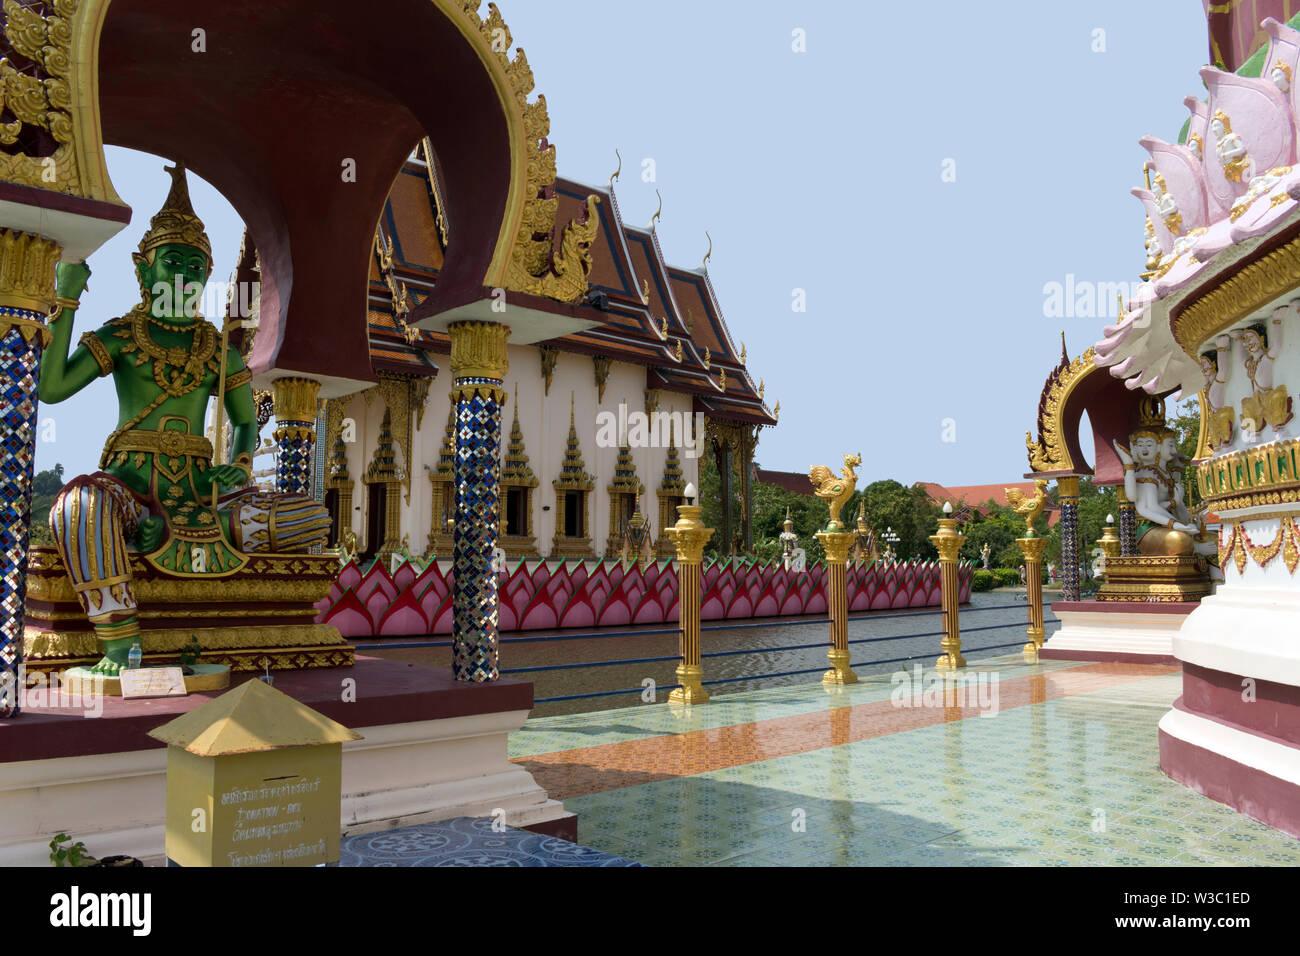 Buddha Statue at Plai Laem Temple in Ban Bo Phut, Koh Samui, Thailand Stock Photo